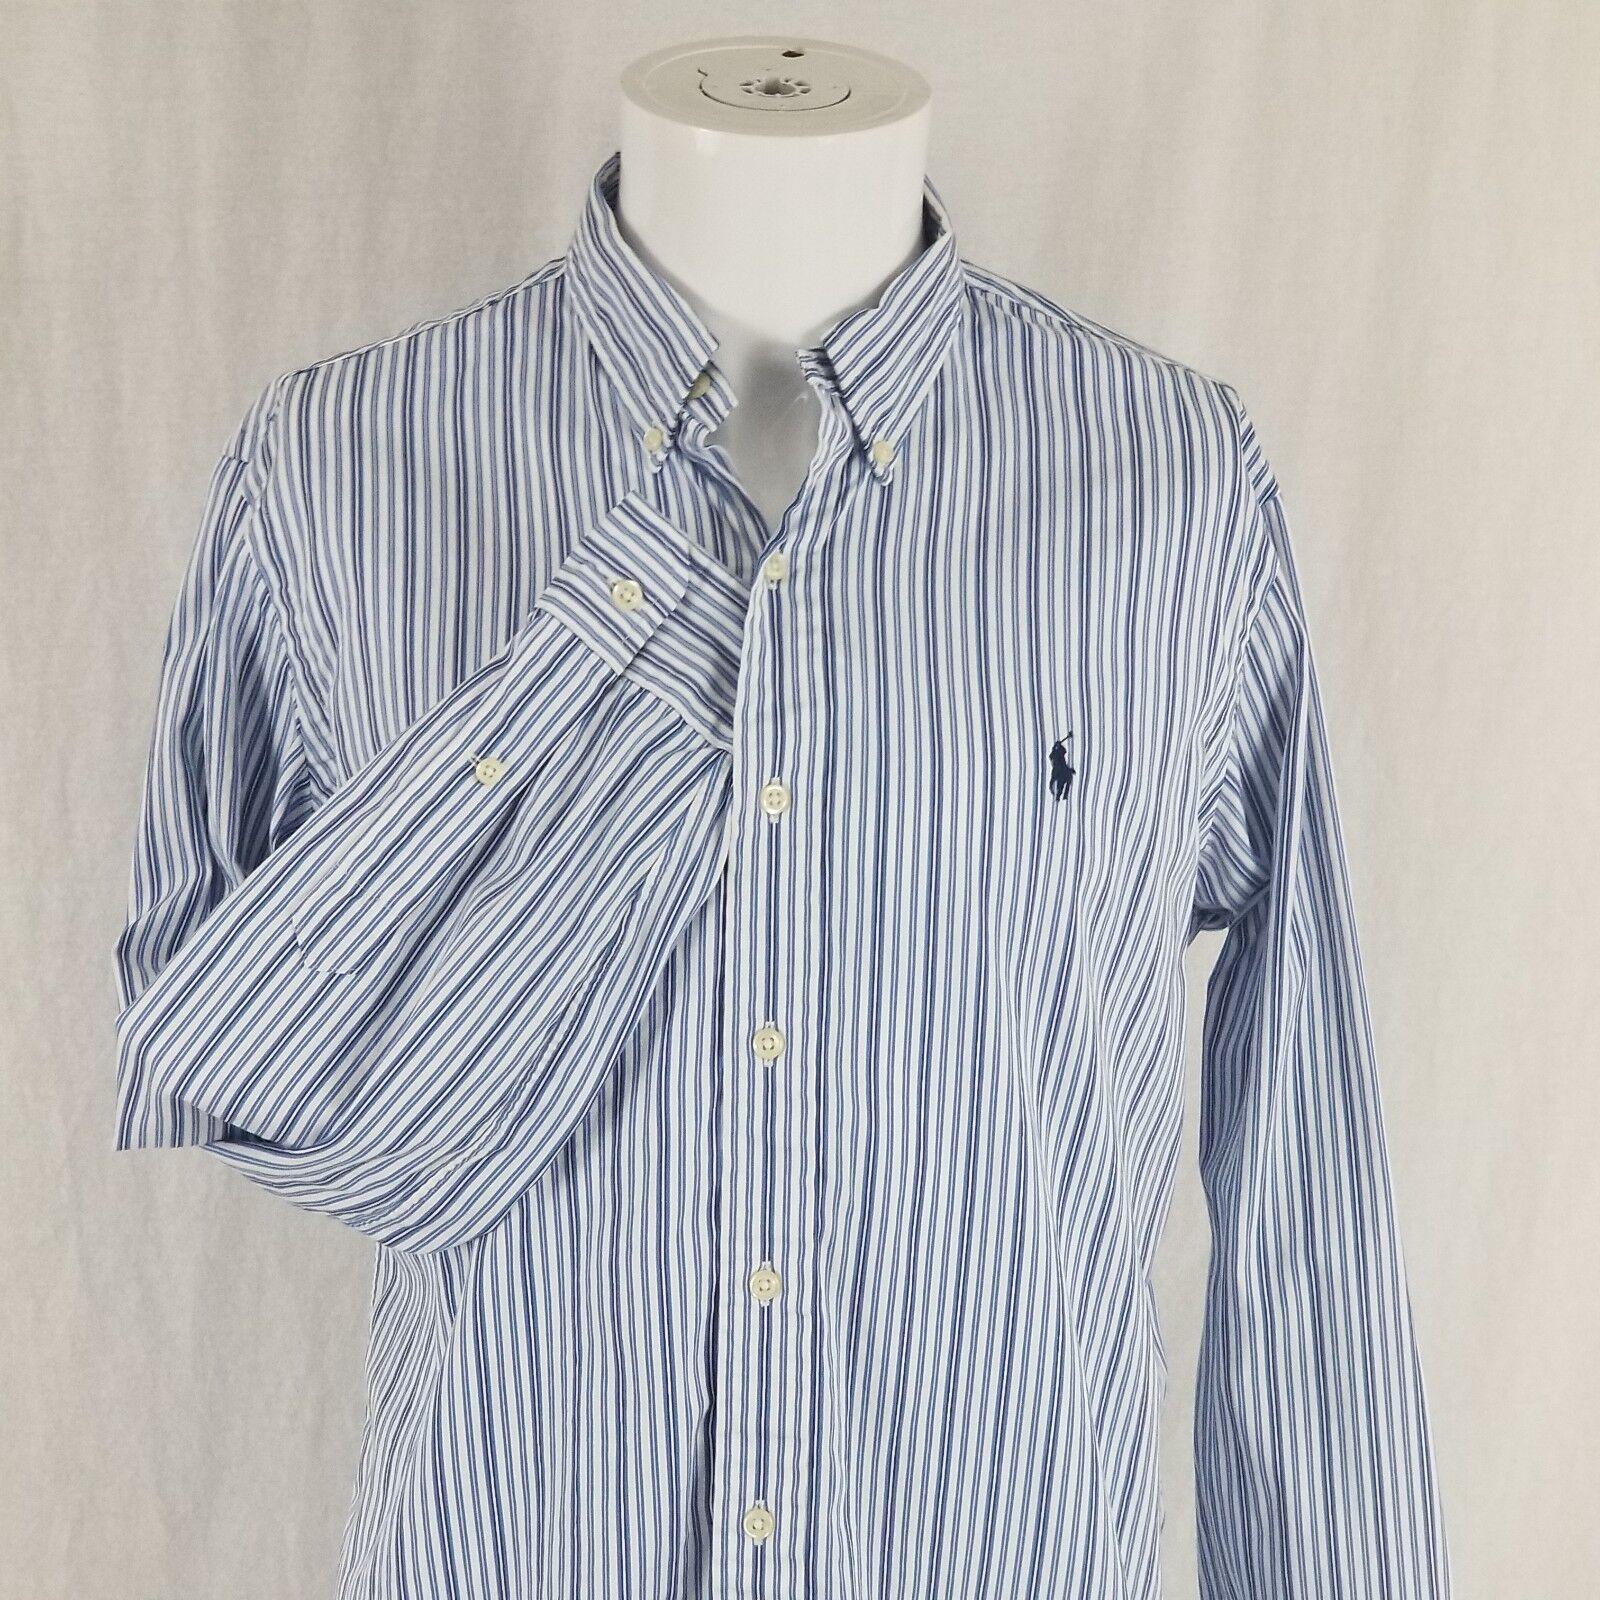 Ralph Lauren Men's Medium bluee Striped Button Down Collared